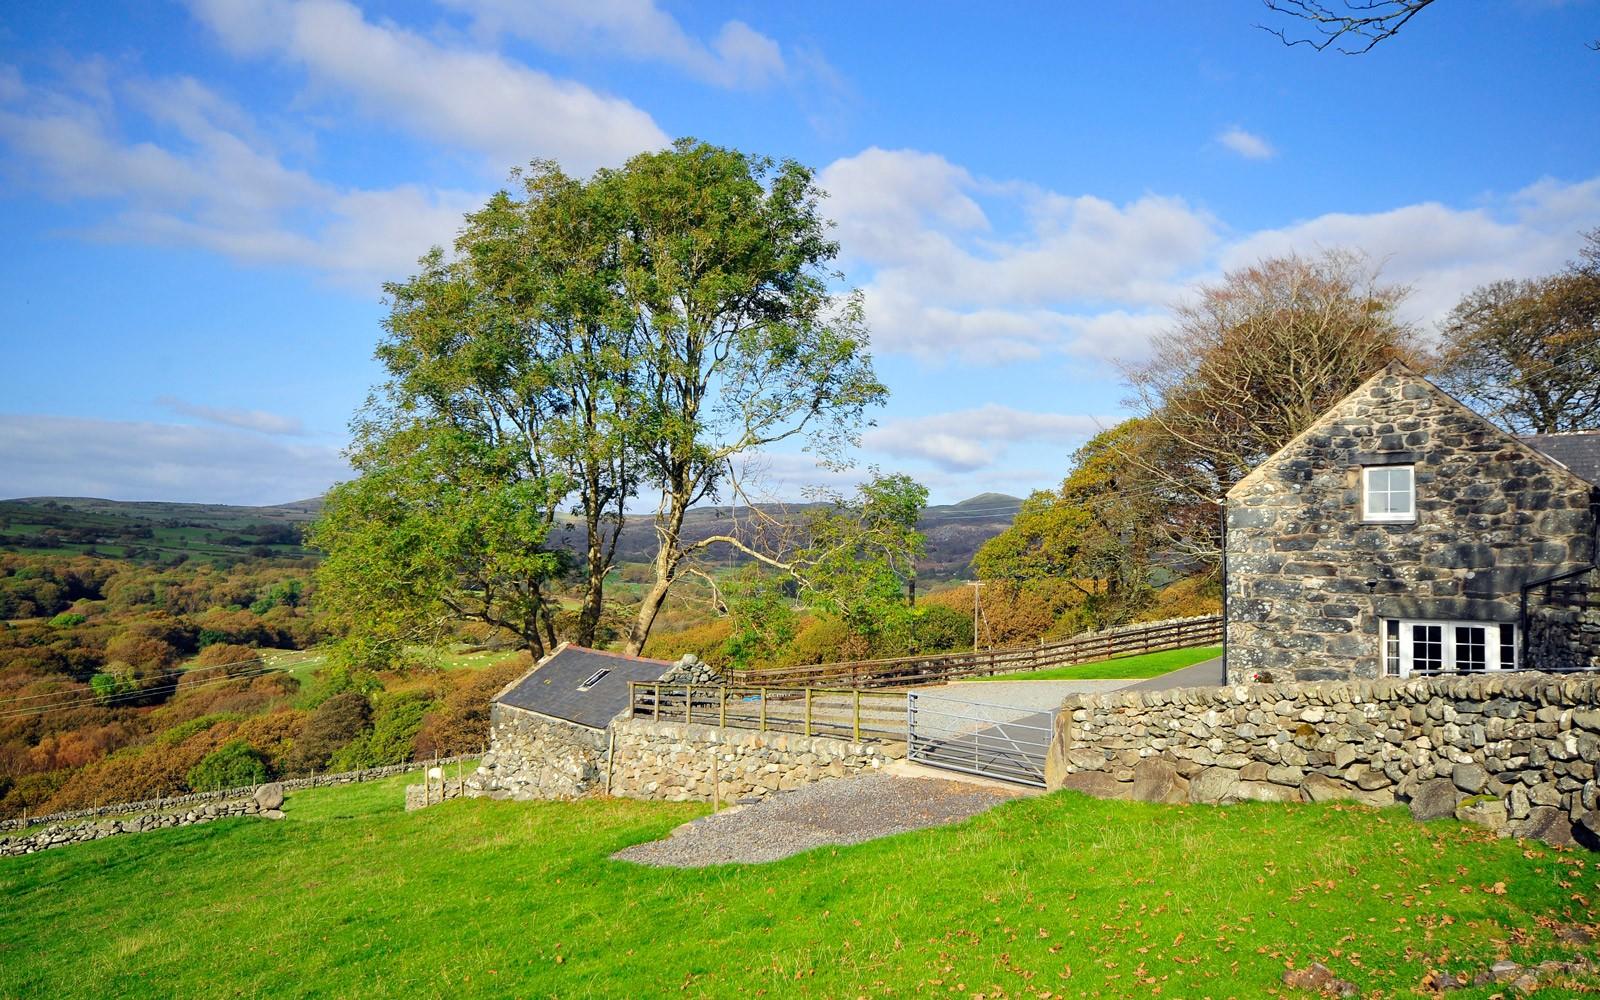 Cwm-Nantcol-Barn-6a82f0d